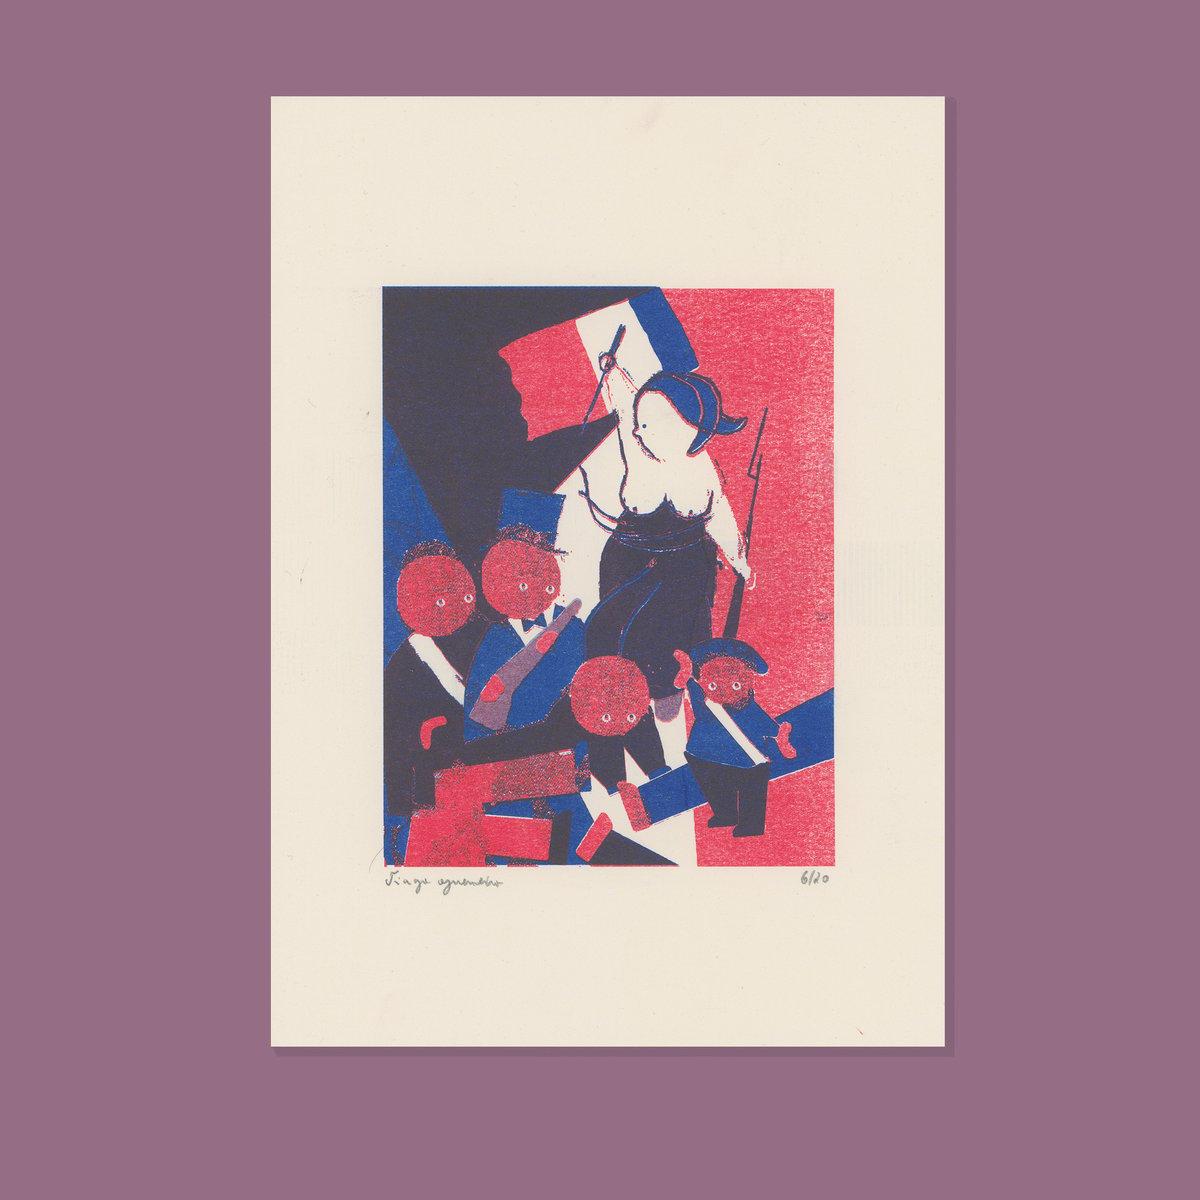 Image of Delacroix